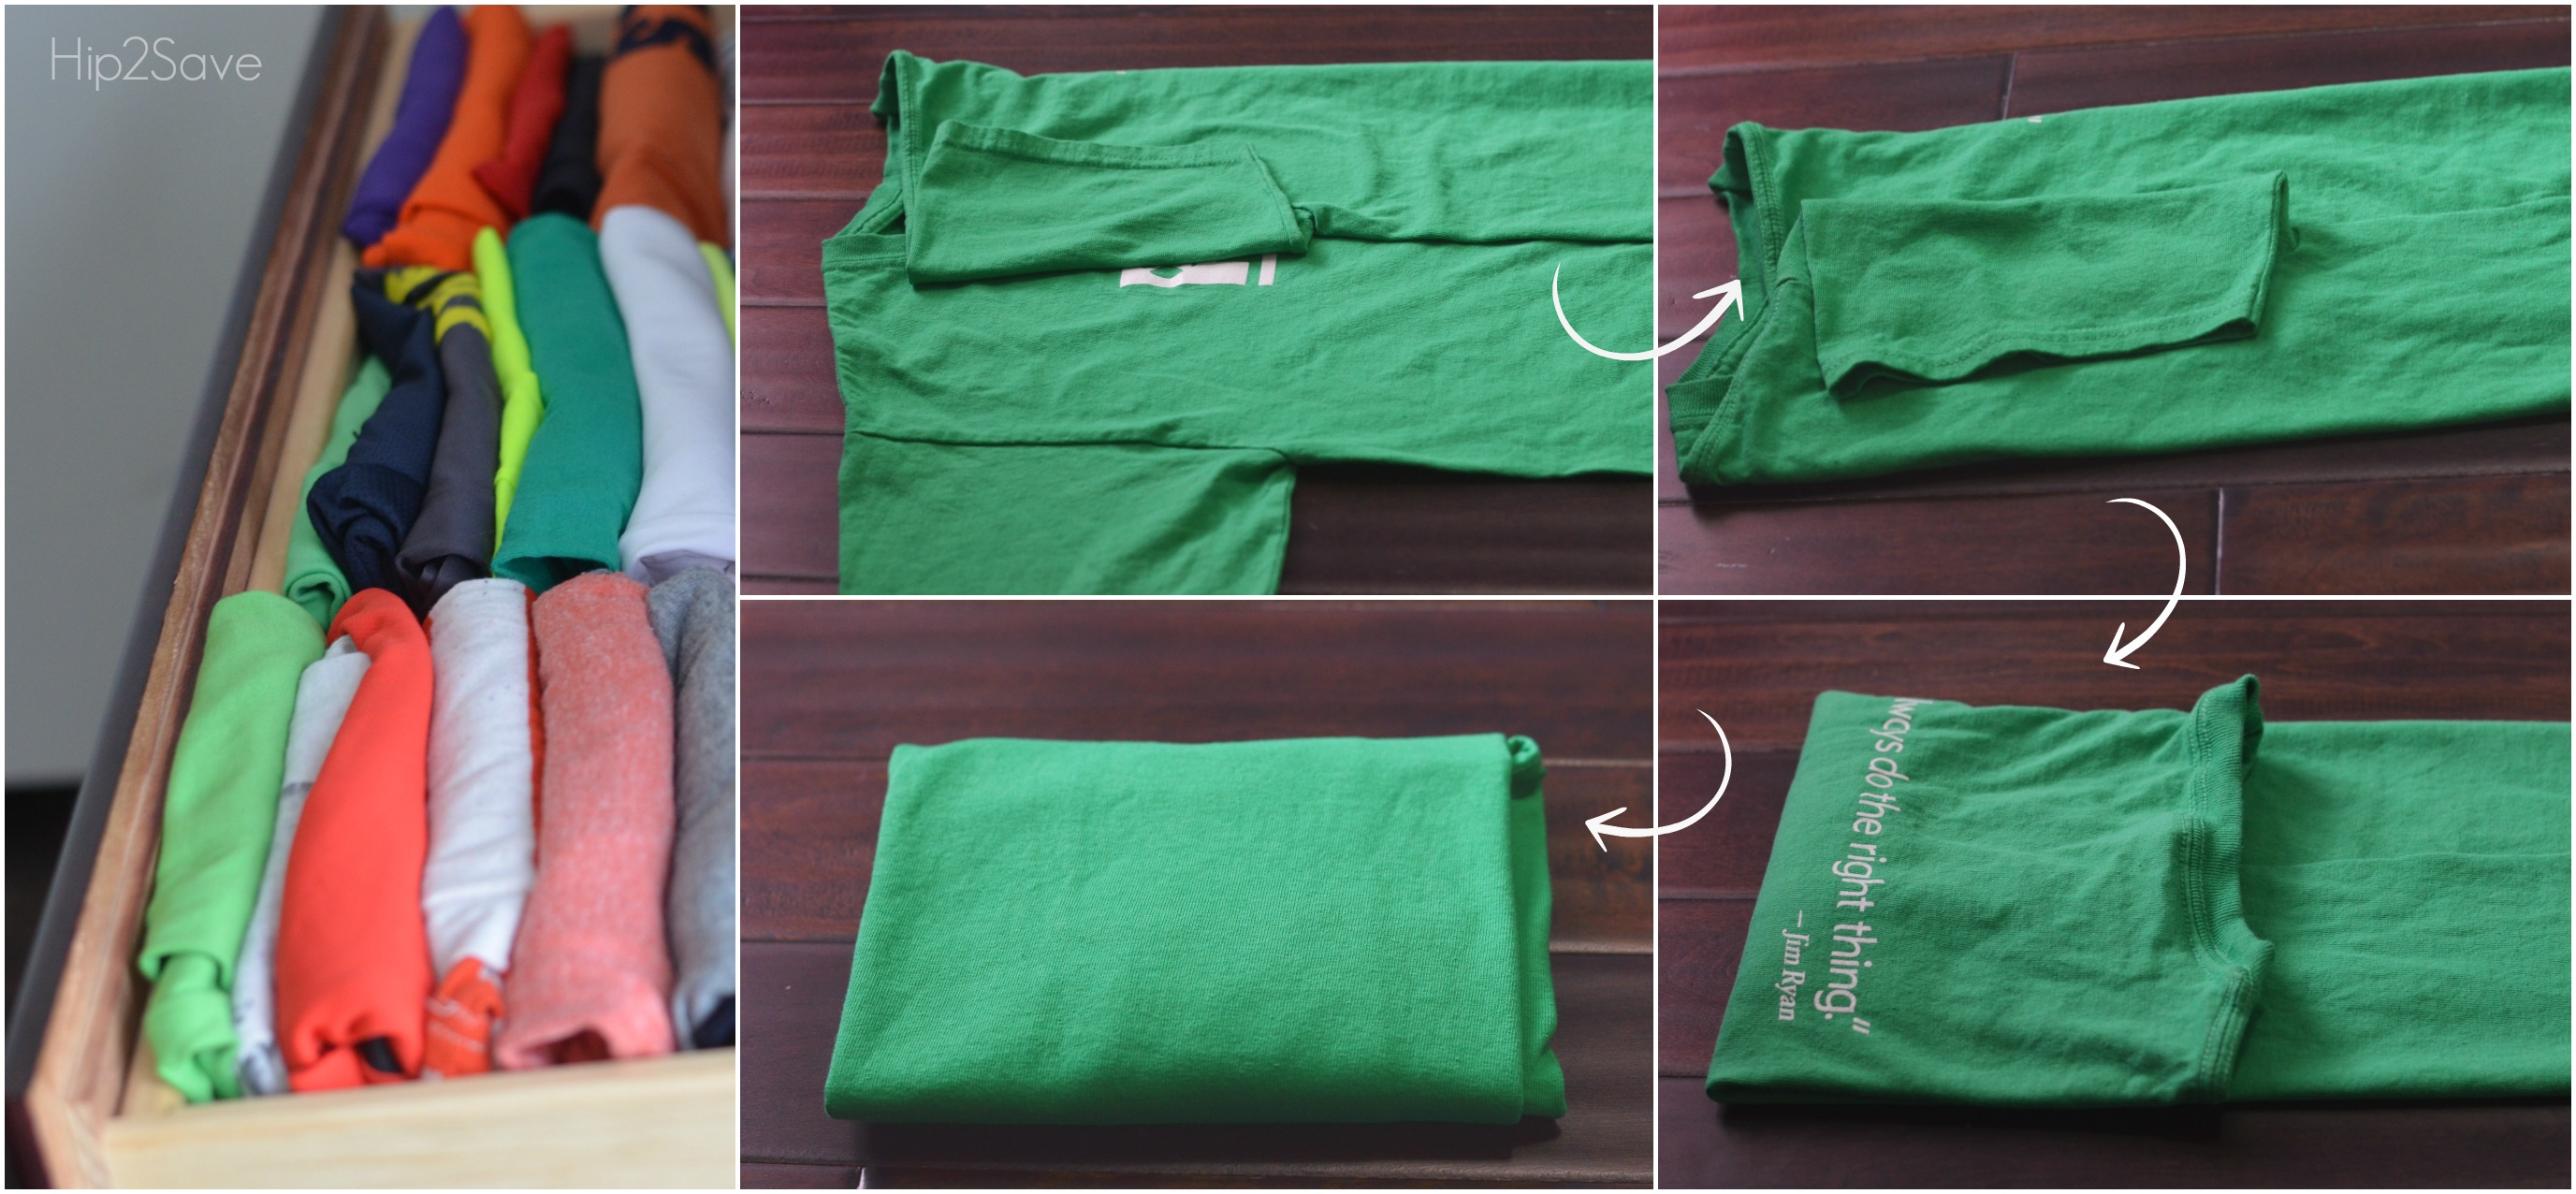 Konmari Style Folding Technique Hip2Save.com